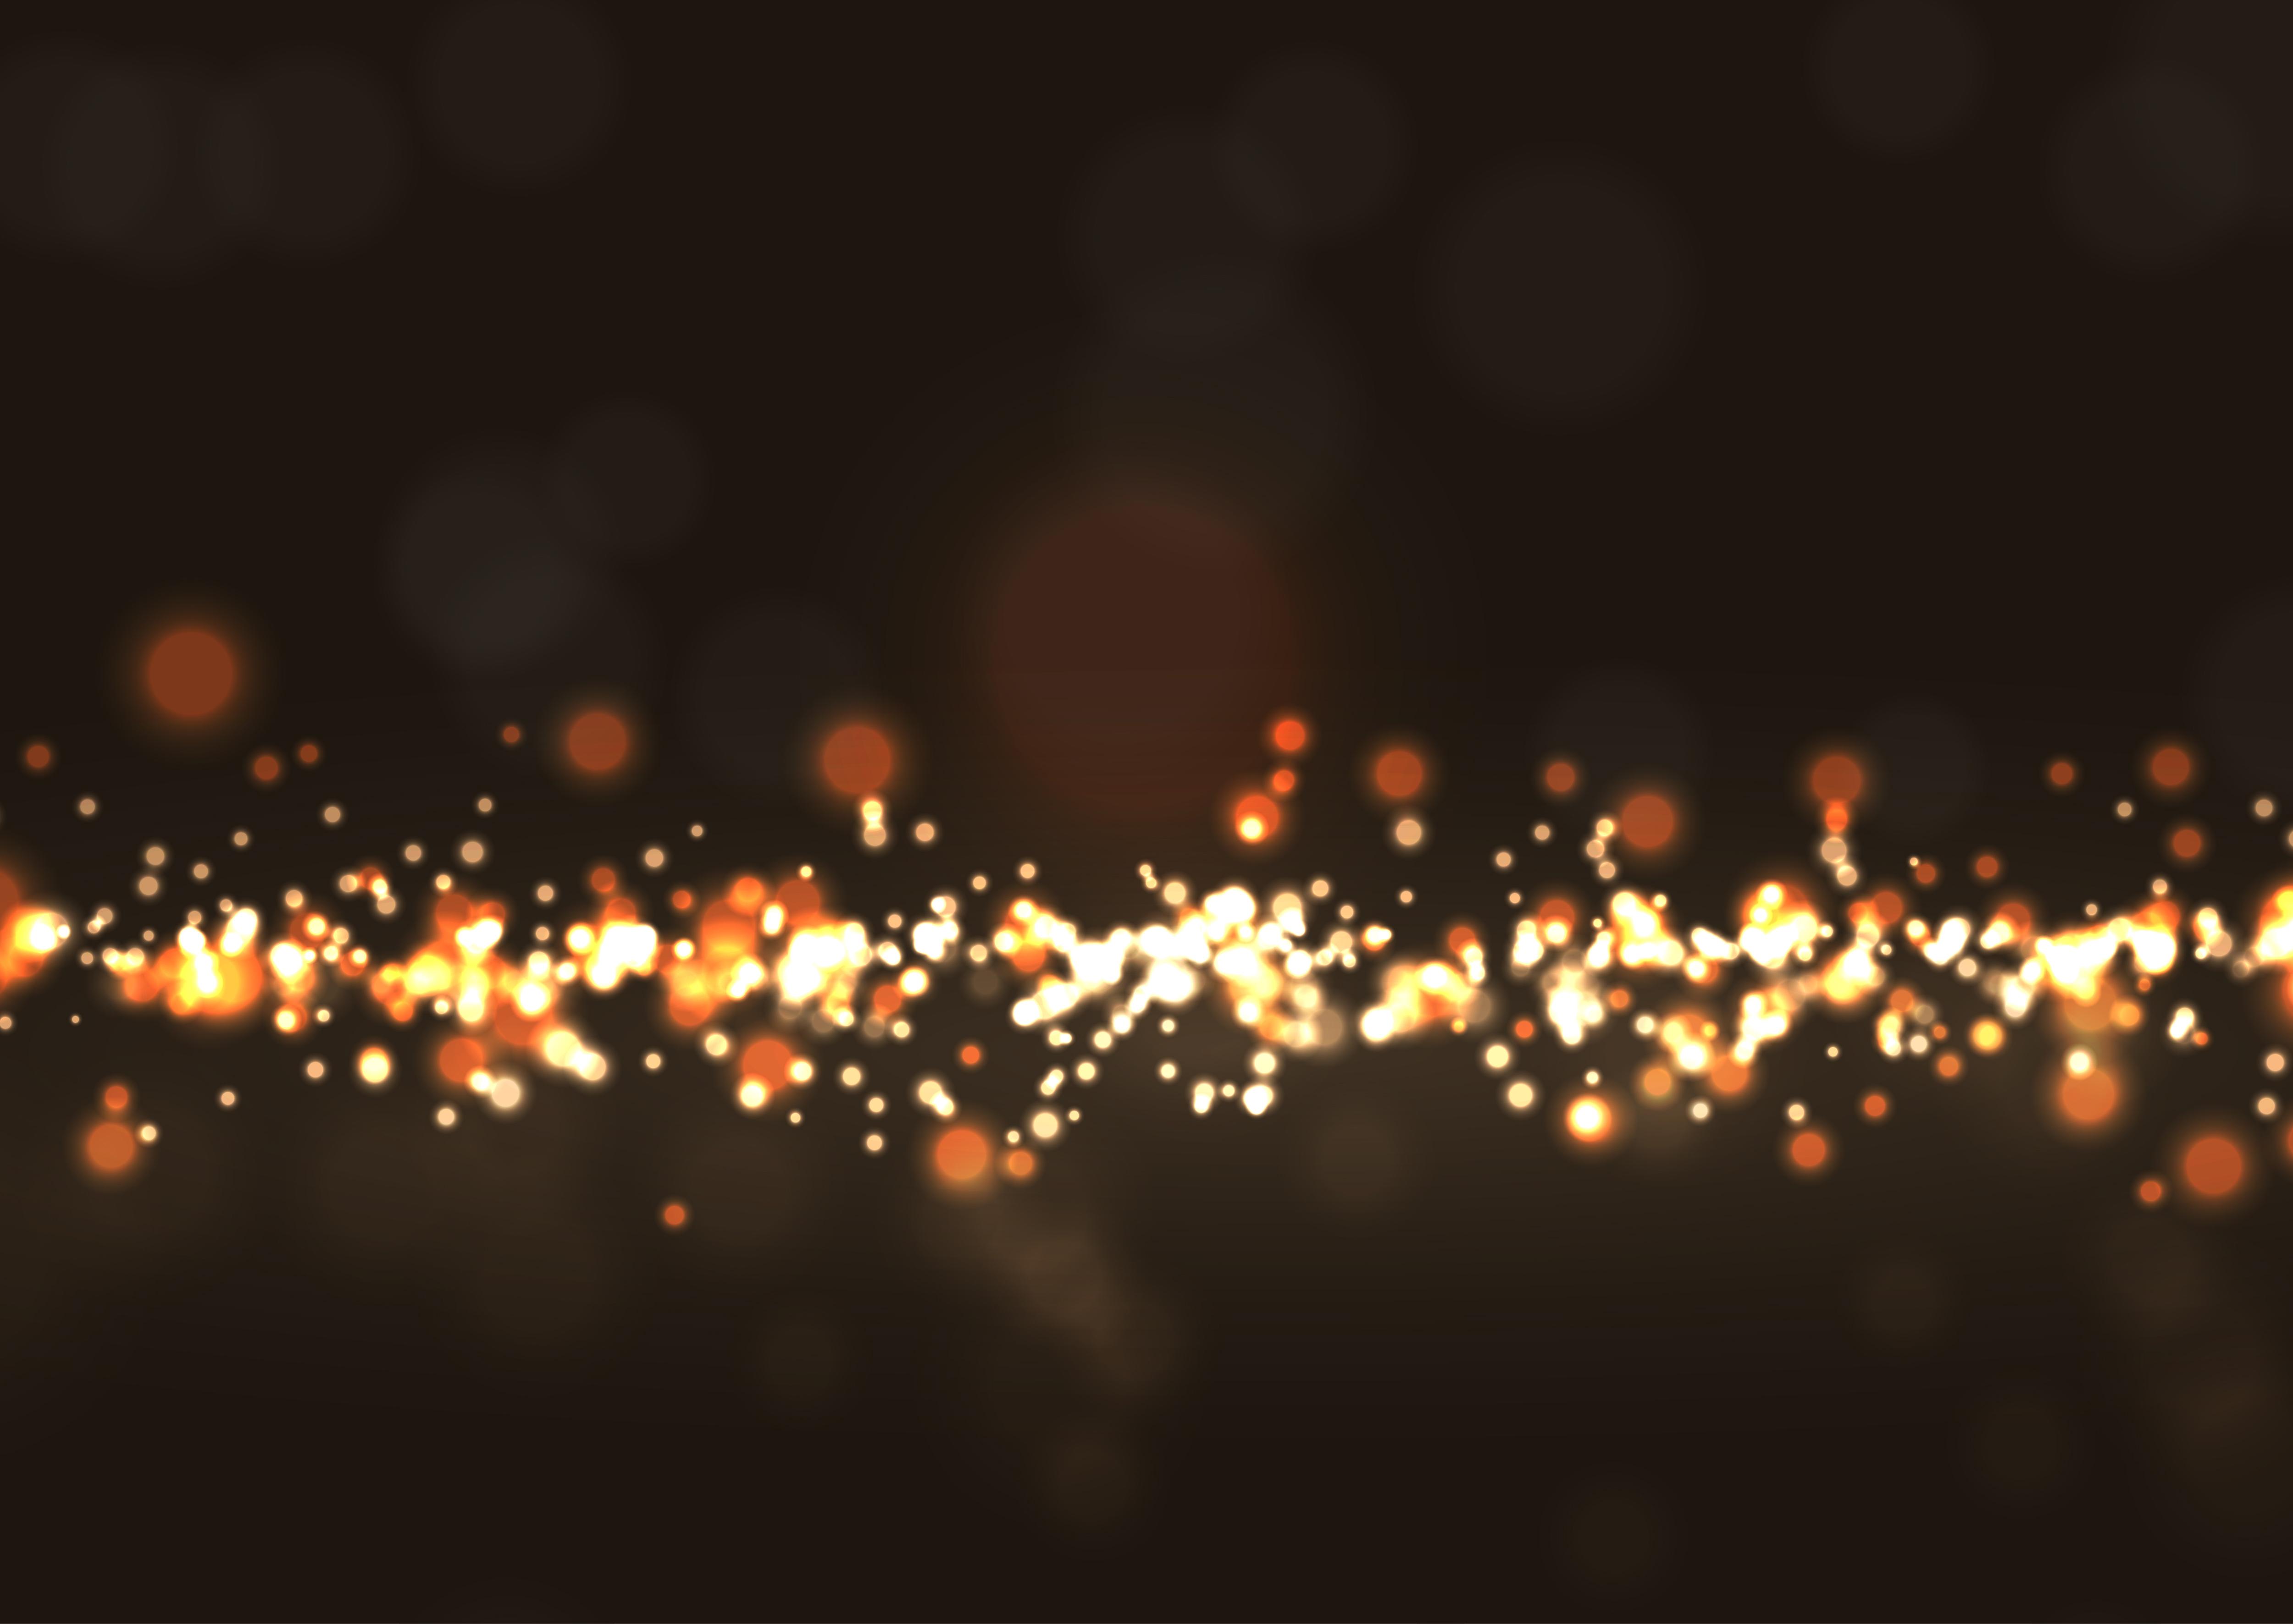 glittery bokeh lights